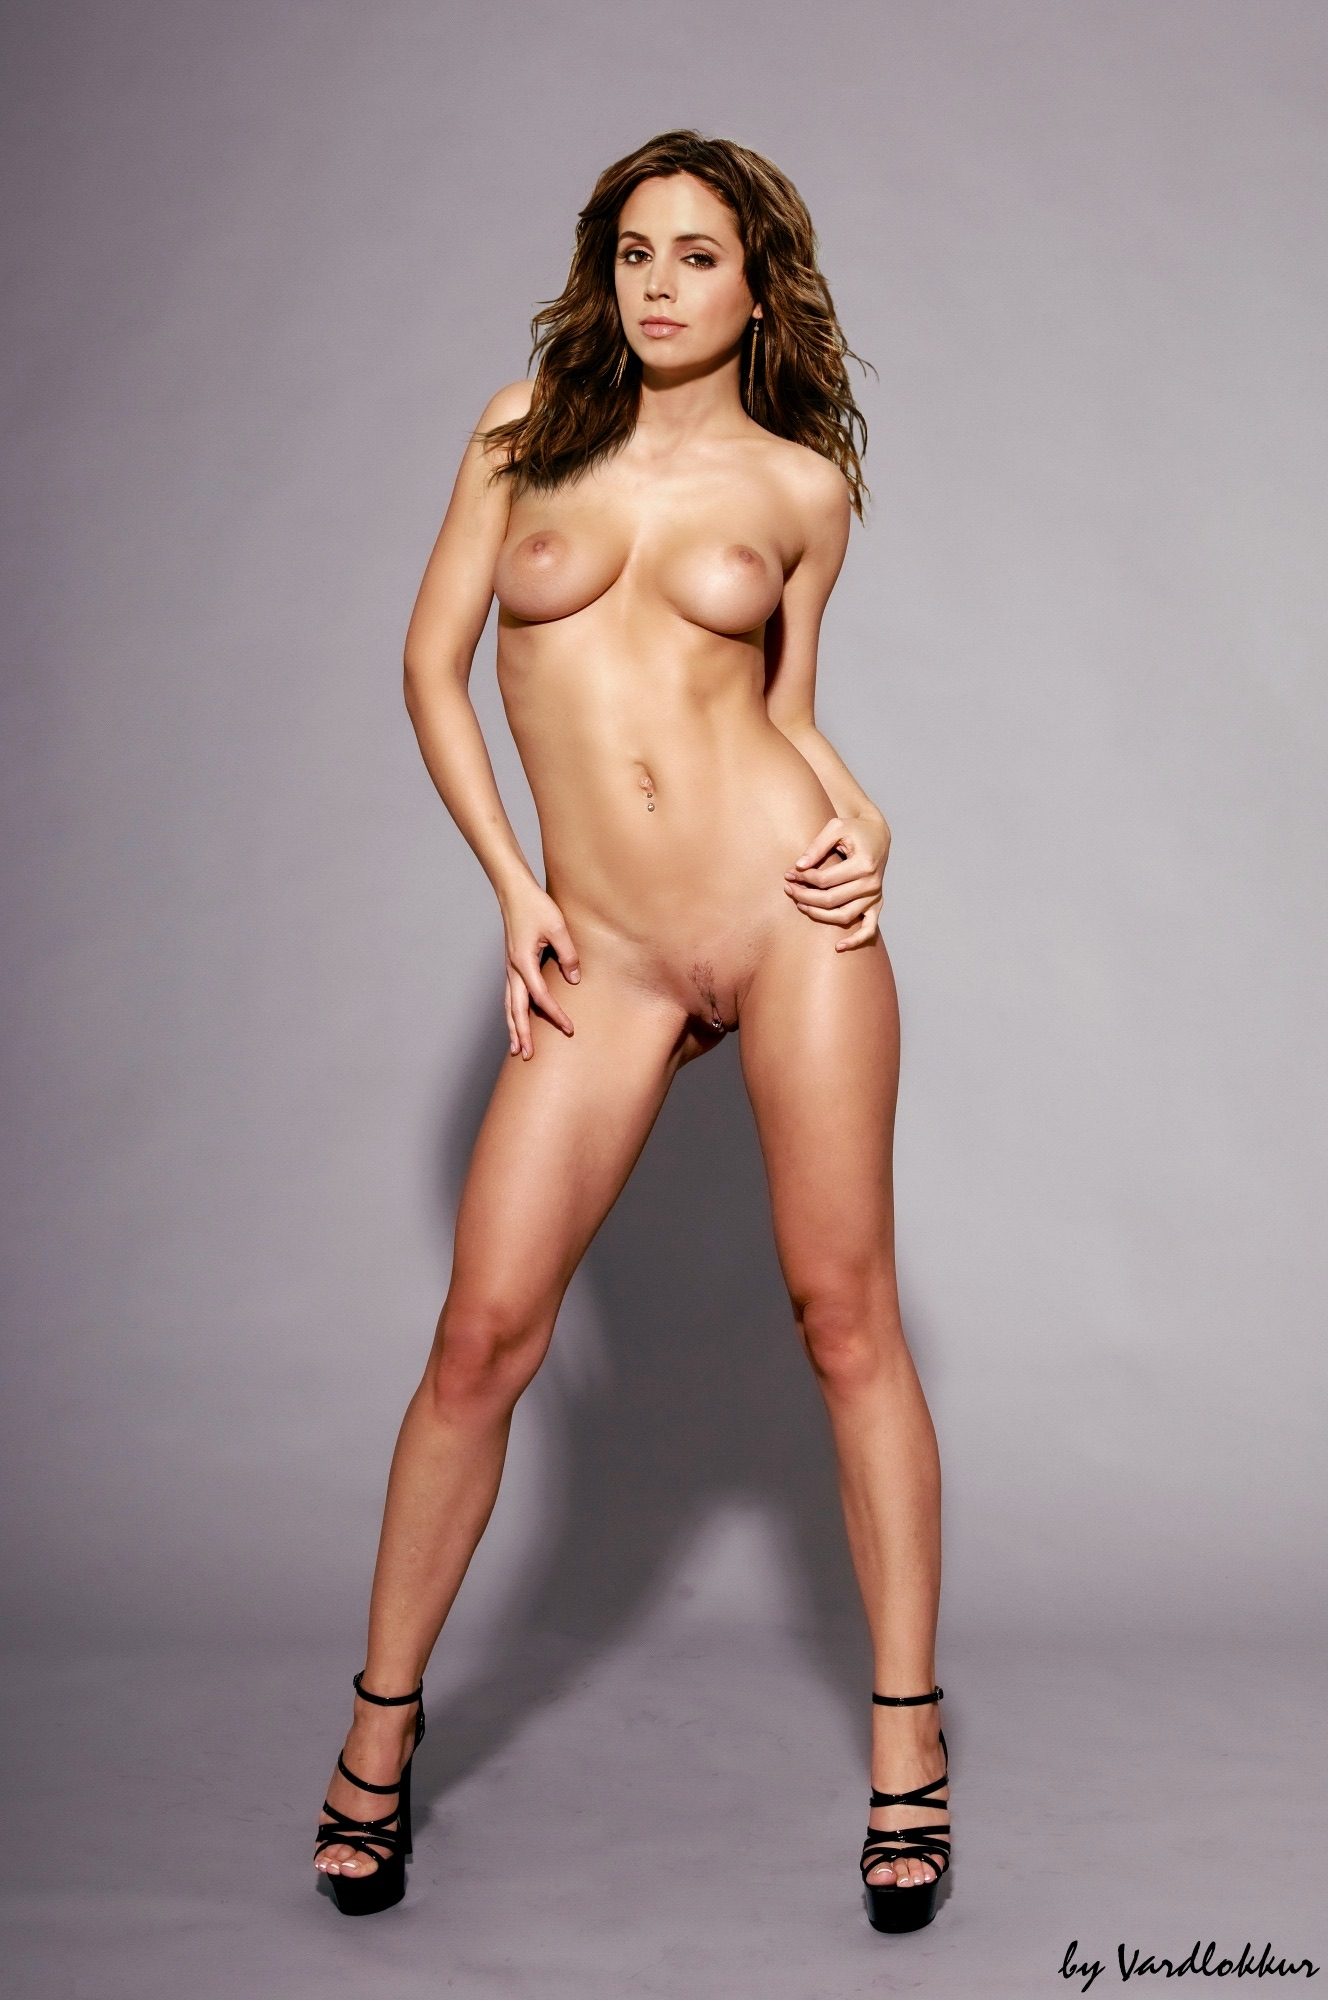 Nude pictures of eliza dushku